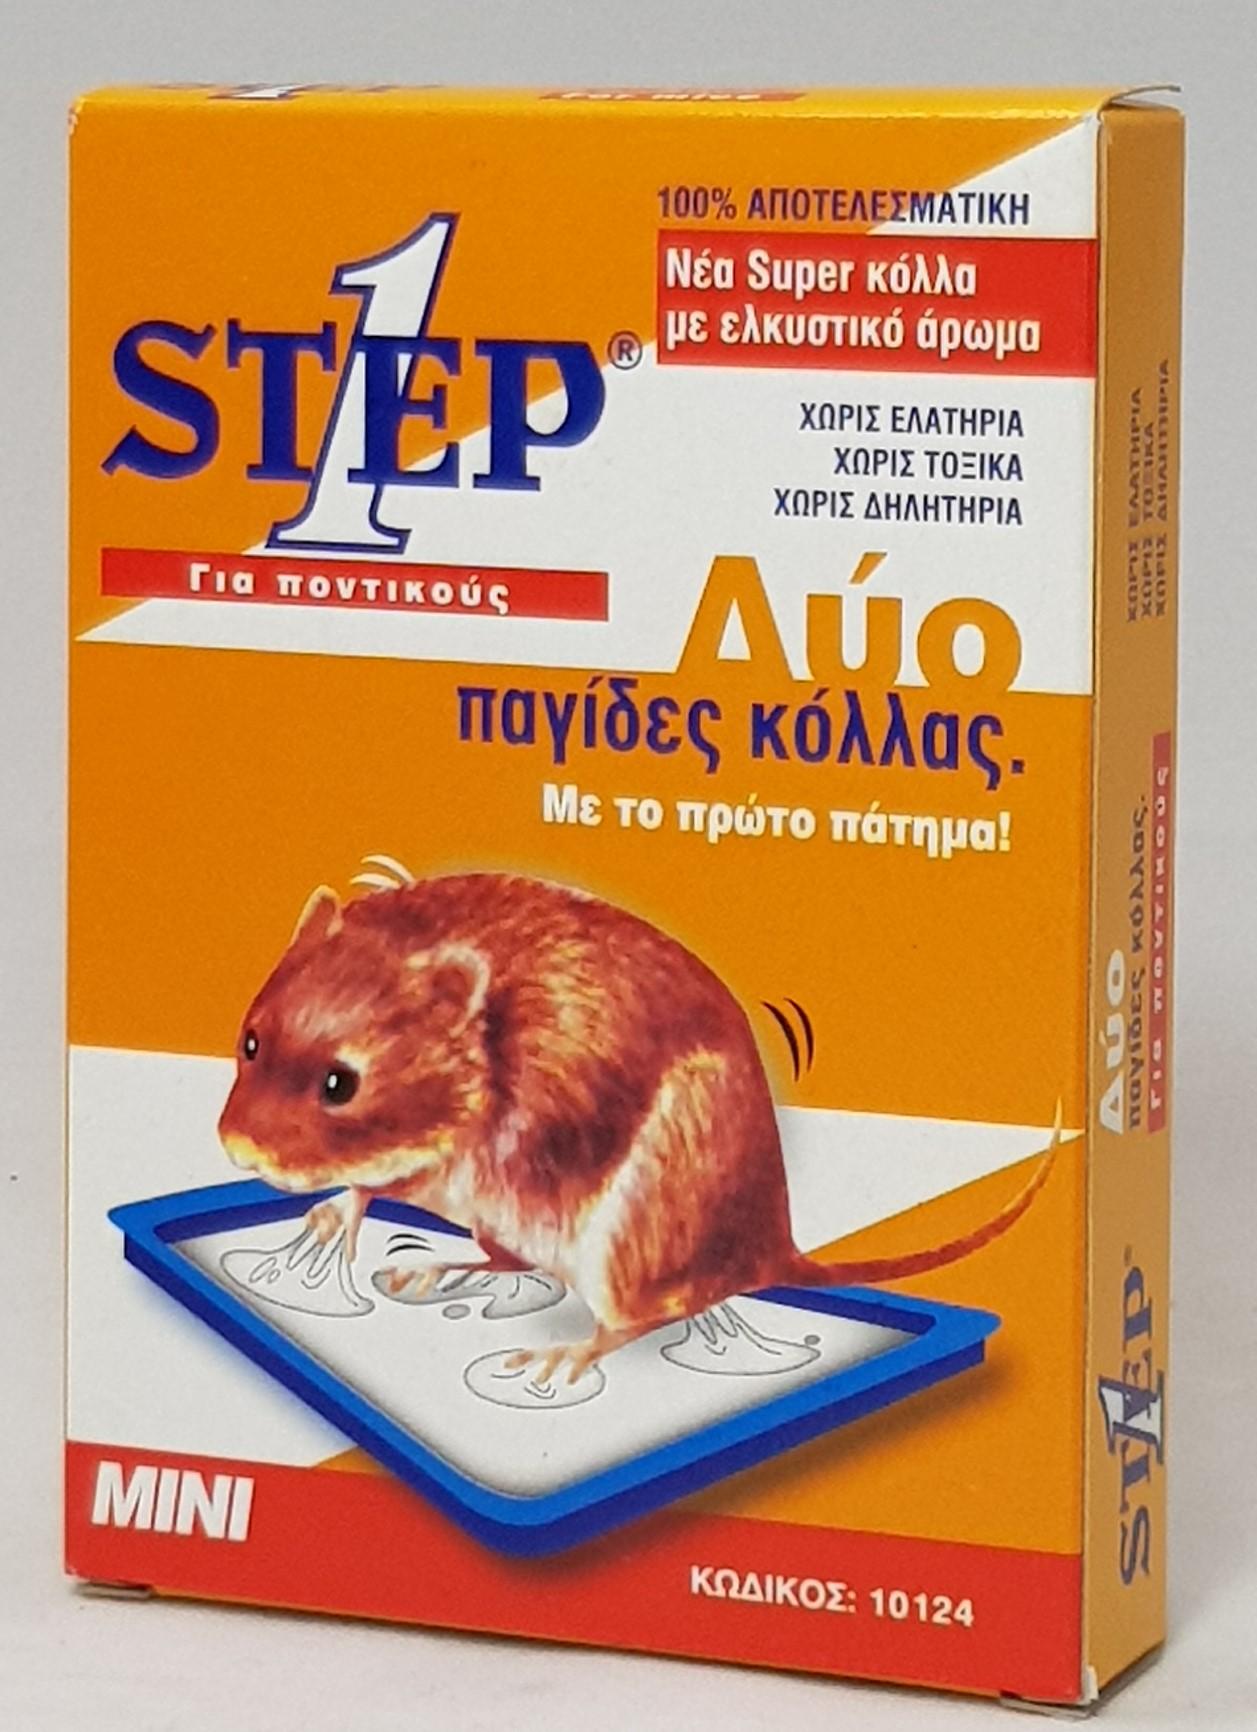 STEP-1 MINI